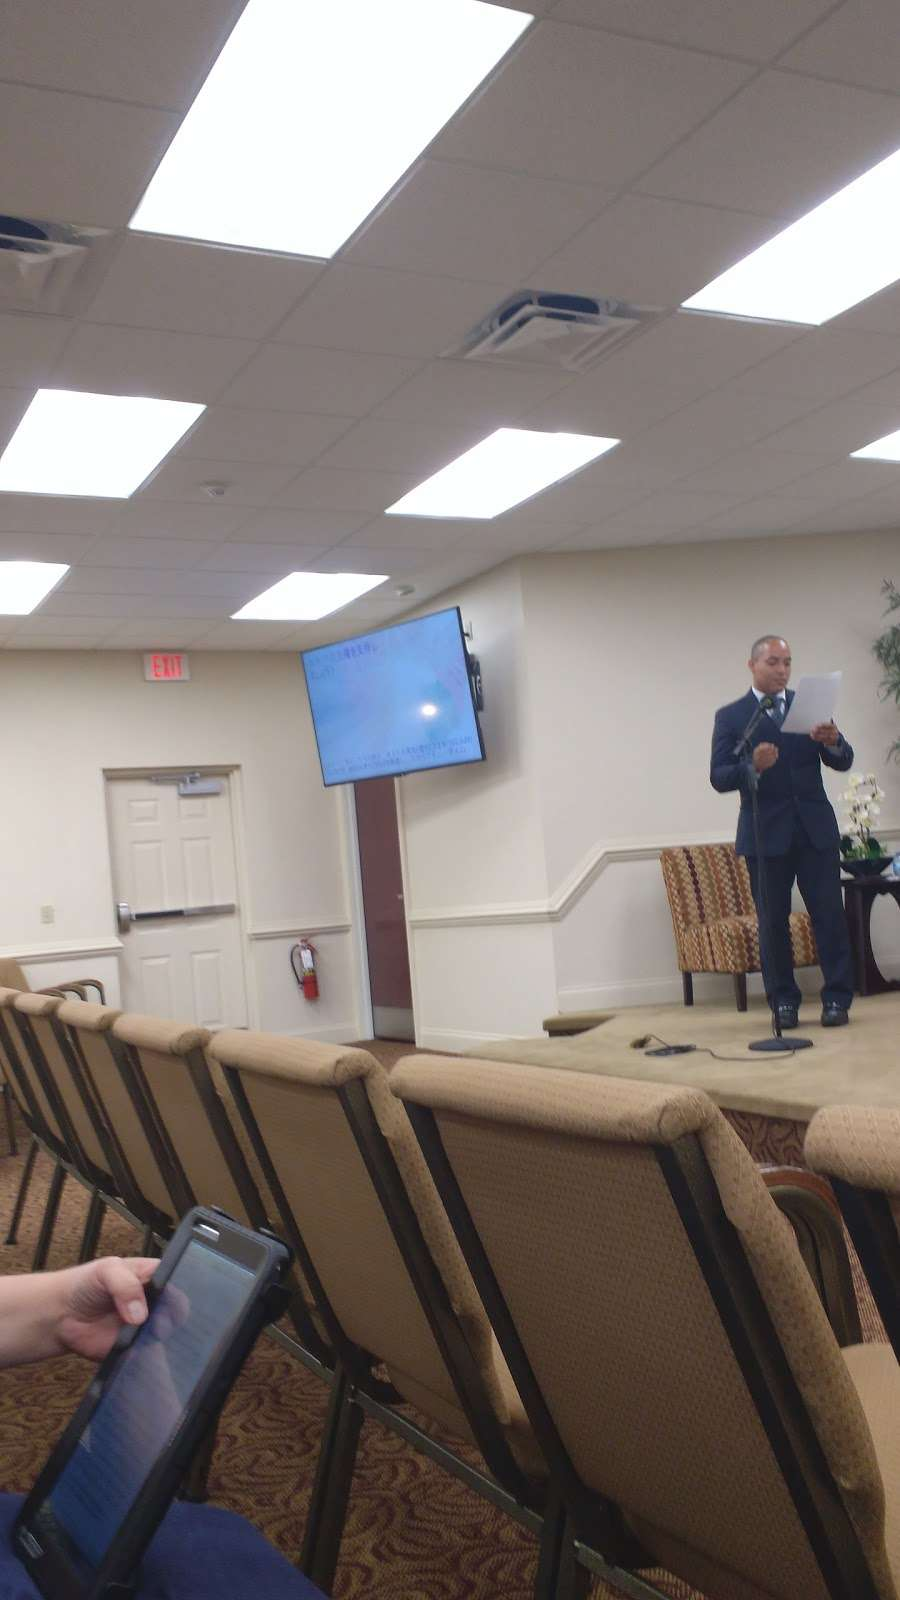 Kingdom Hall of Jehovahs Witnesses - church    Photo 2 of 8   Address: 4133 Redditt Rd, Orlando, FL 32822, USA   Phone: (407) 275-7060